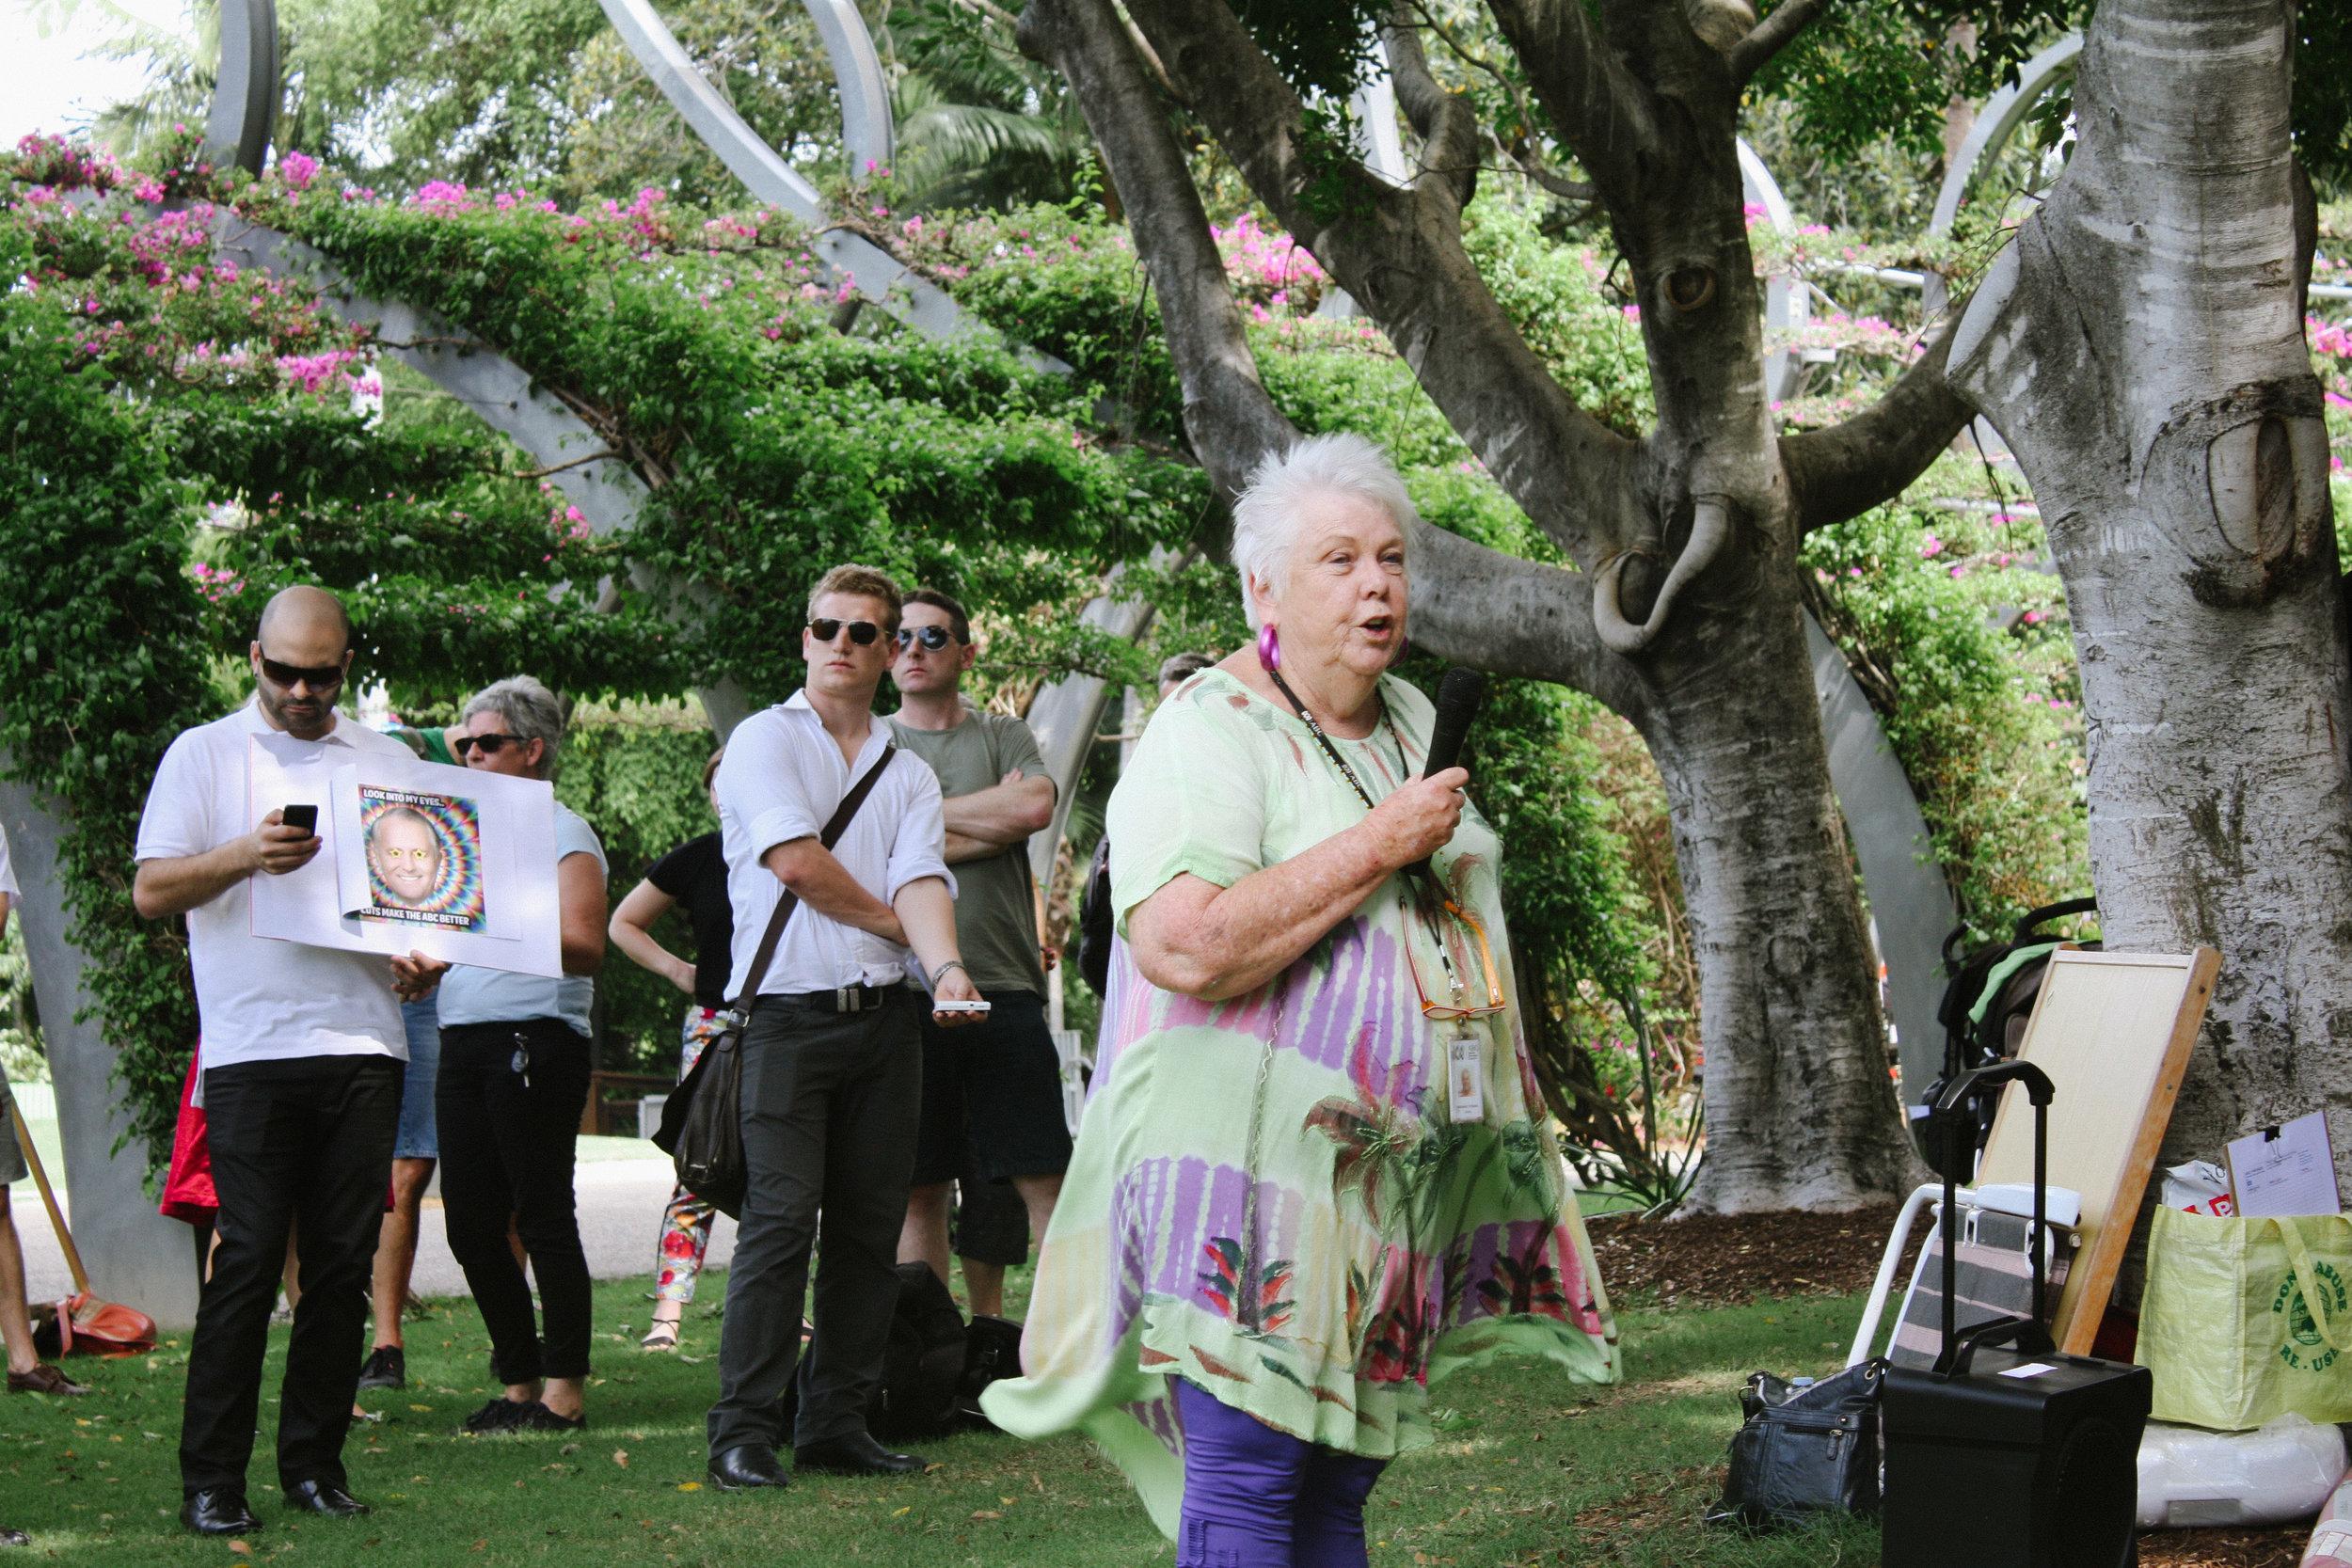 Lesly Lotha_Newzulu Australia_ABC cuts protest_Brisbane 01